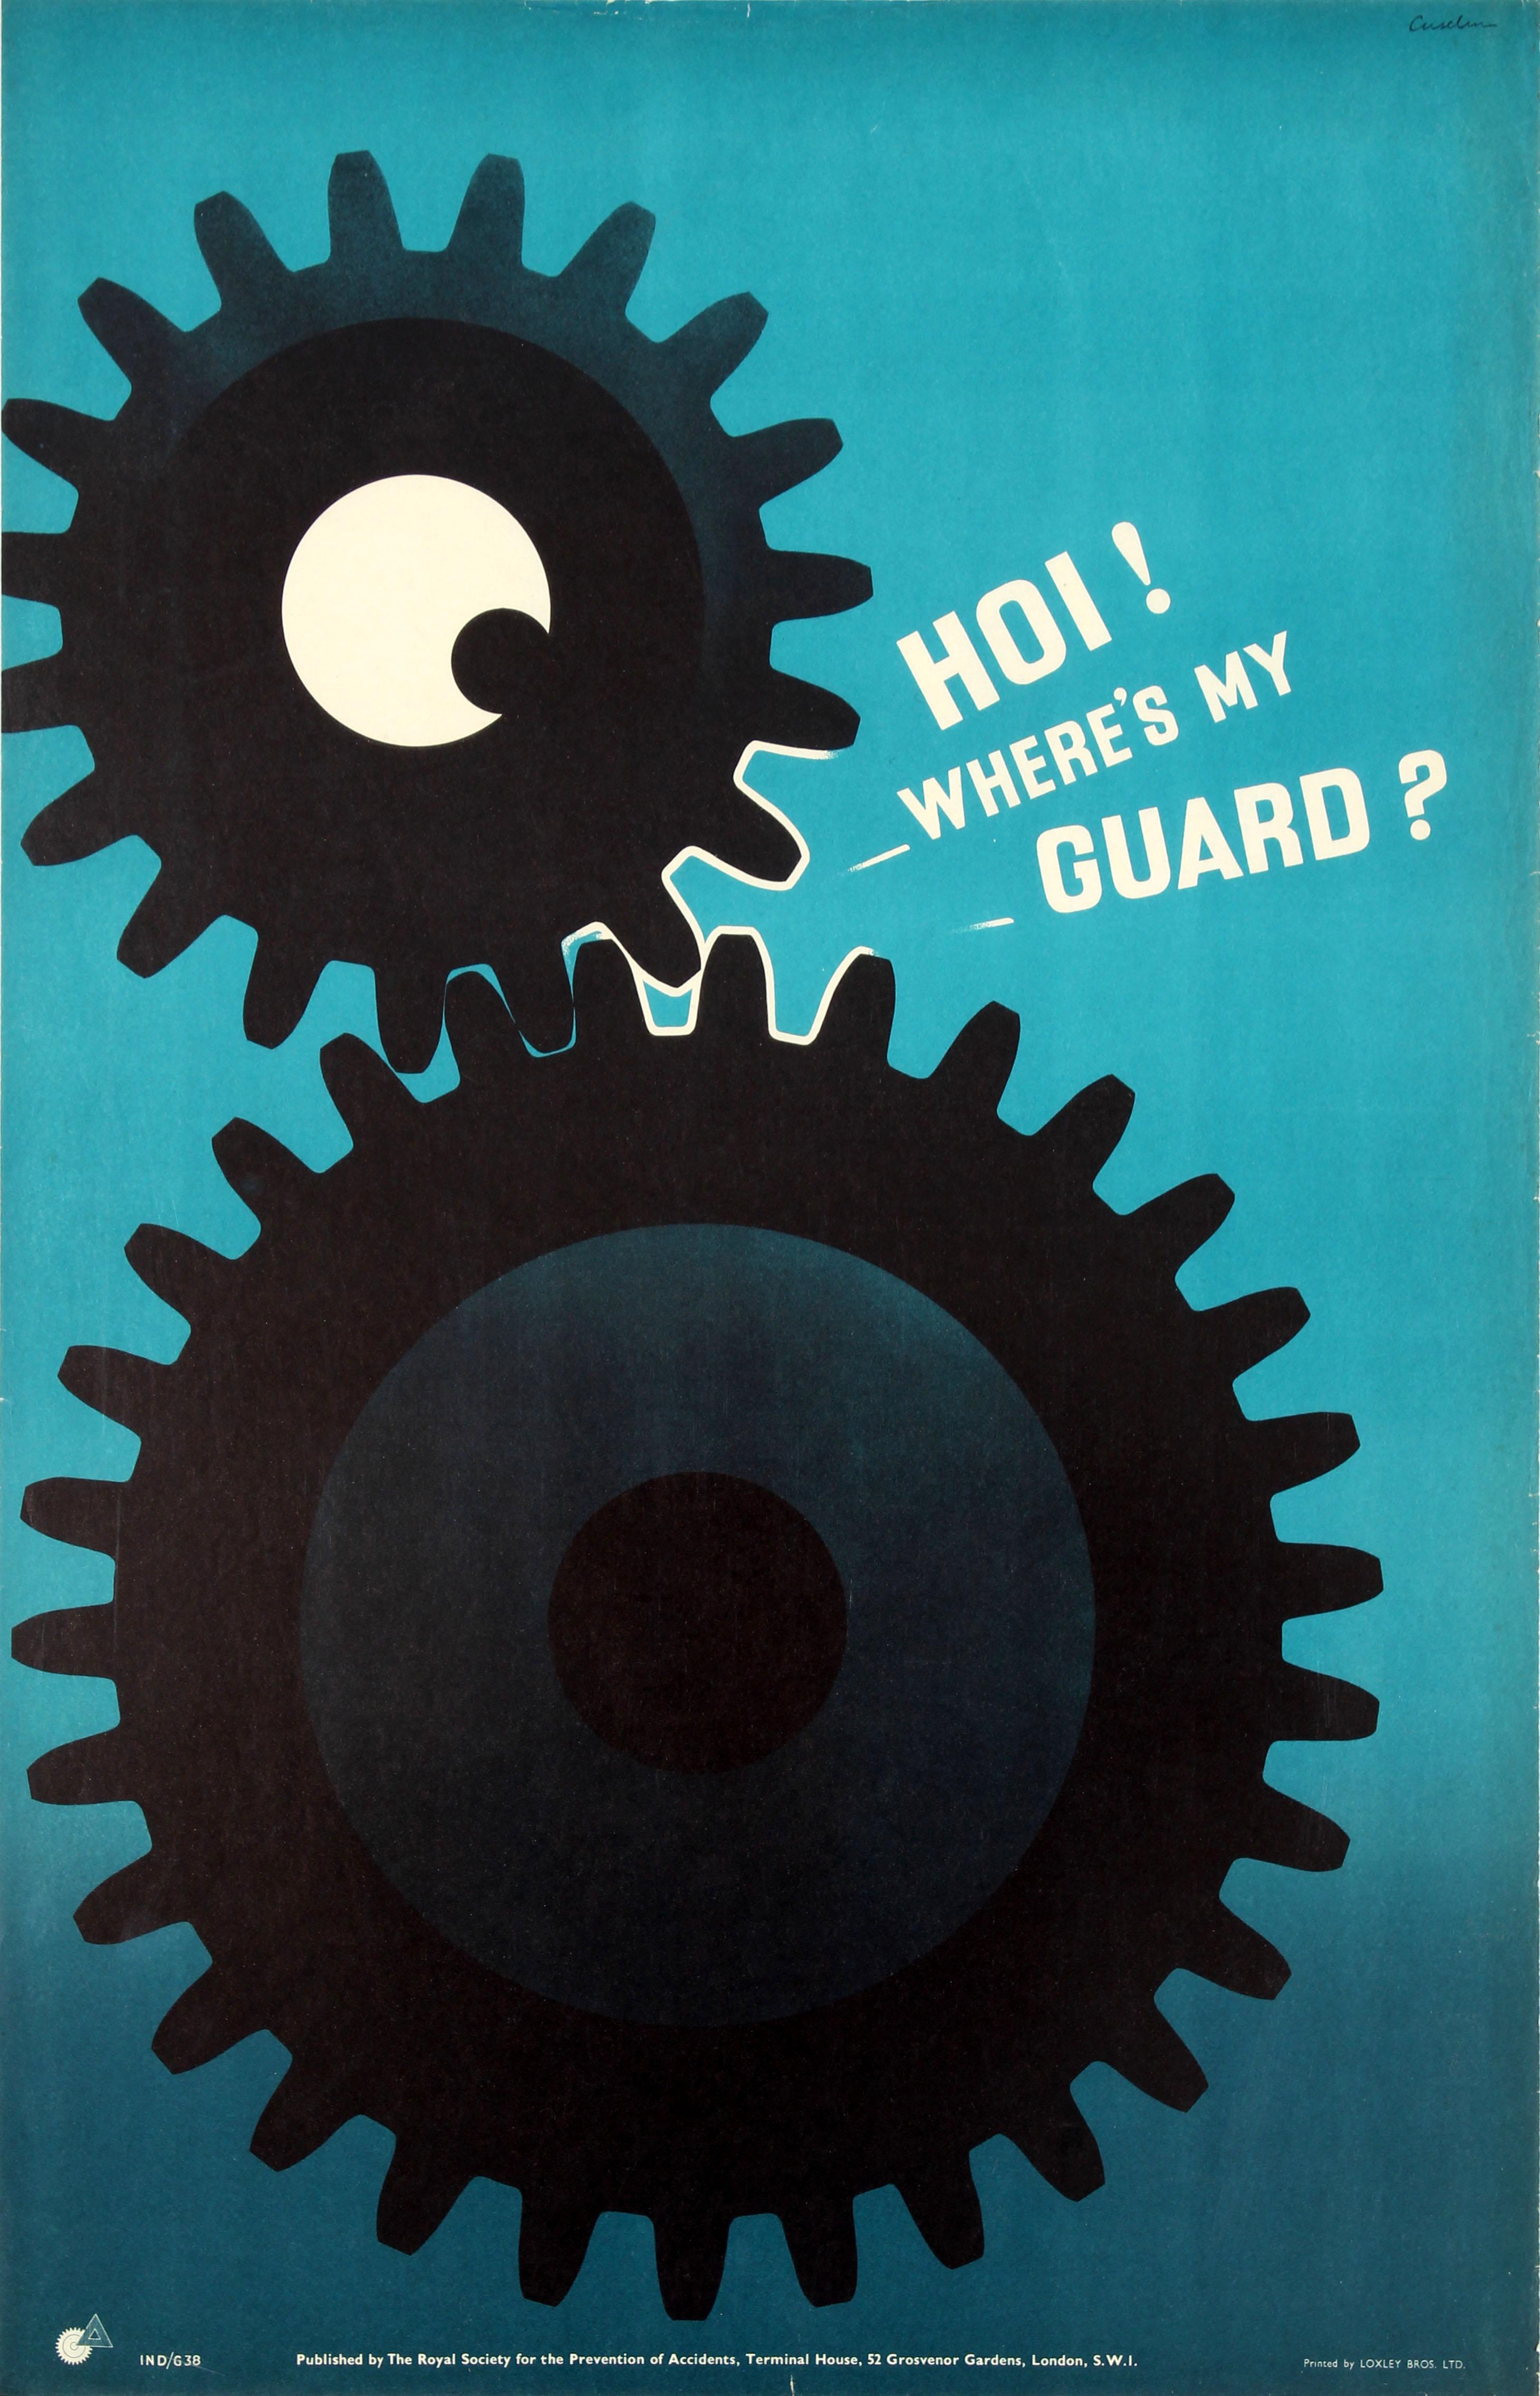 Lot 44 - Propaganda Poster Gear Guard ROSPA Midcentury Modern